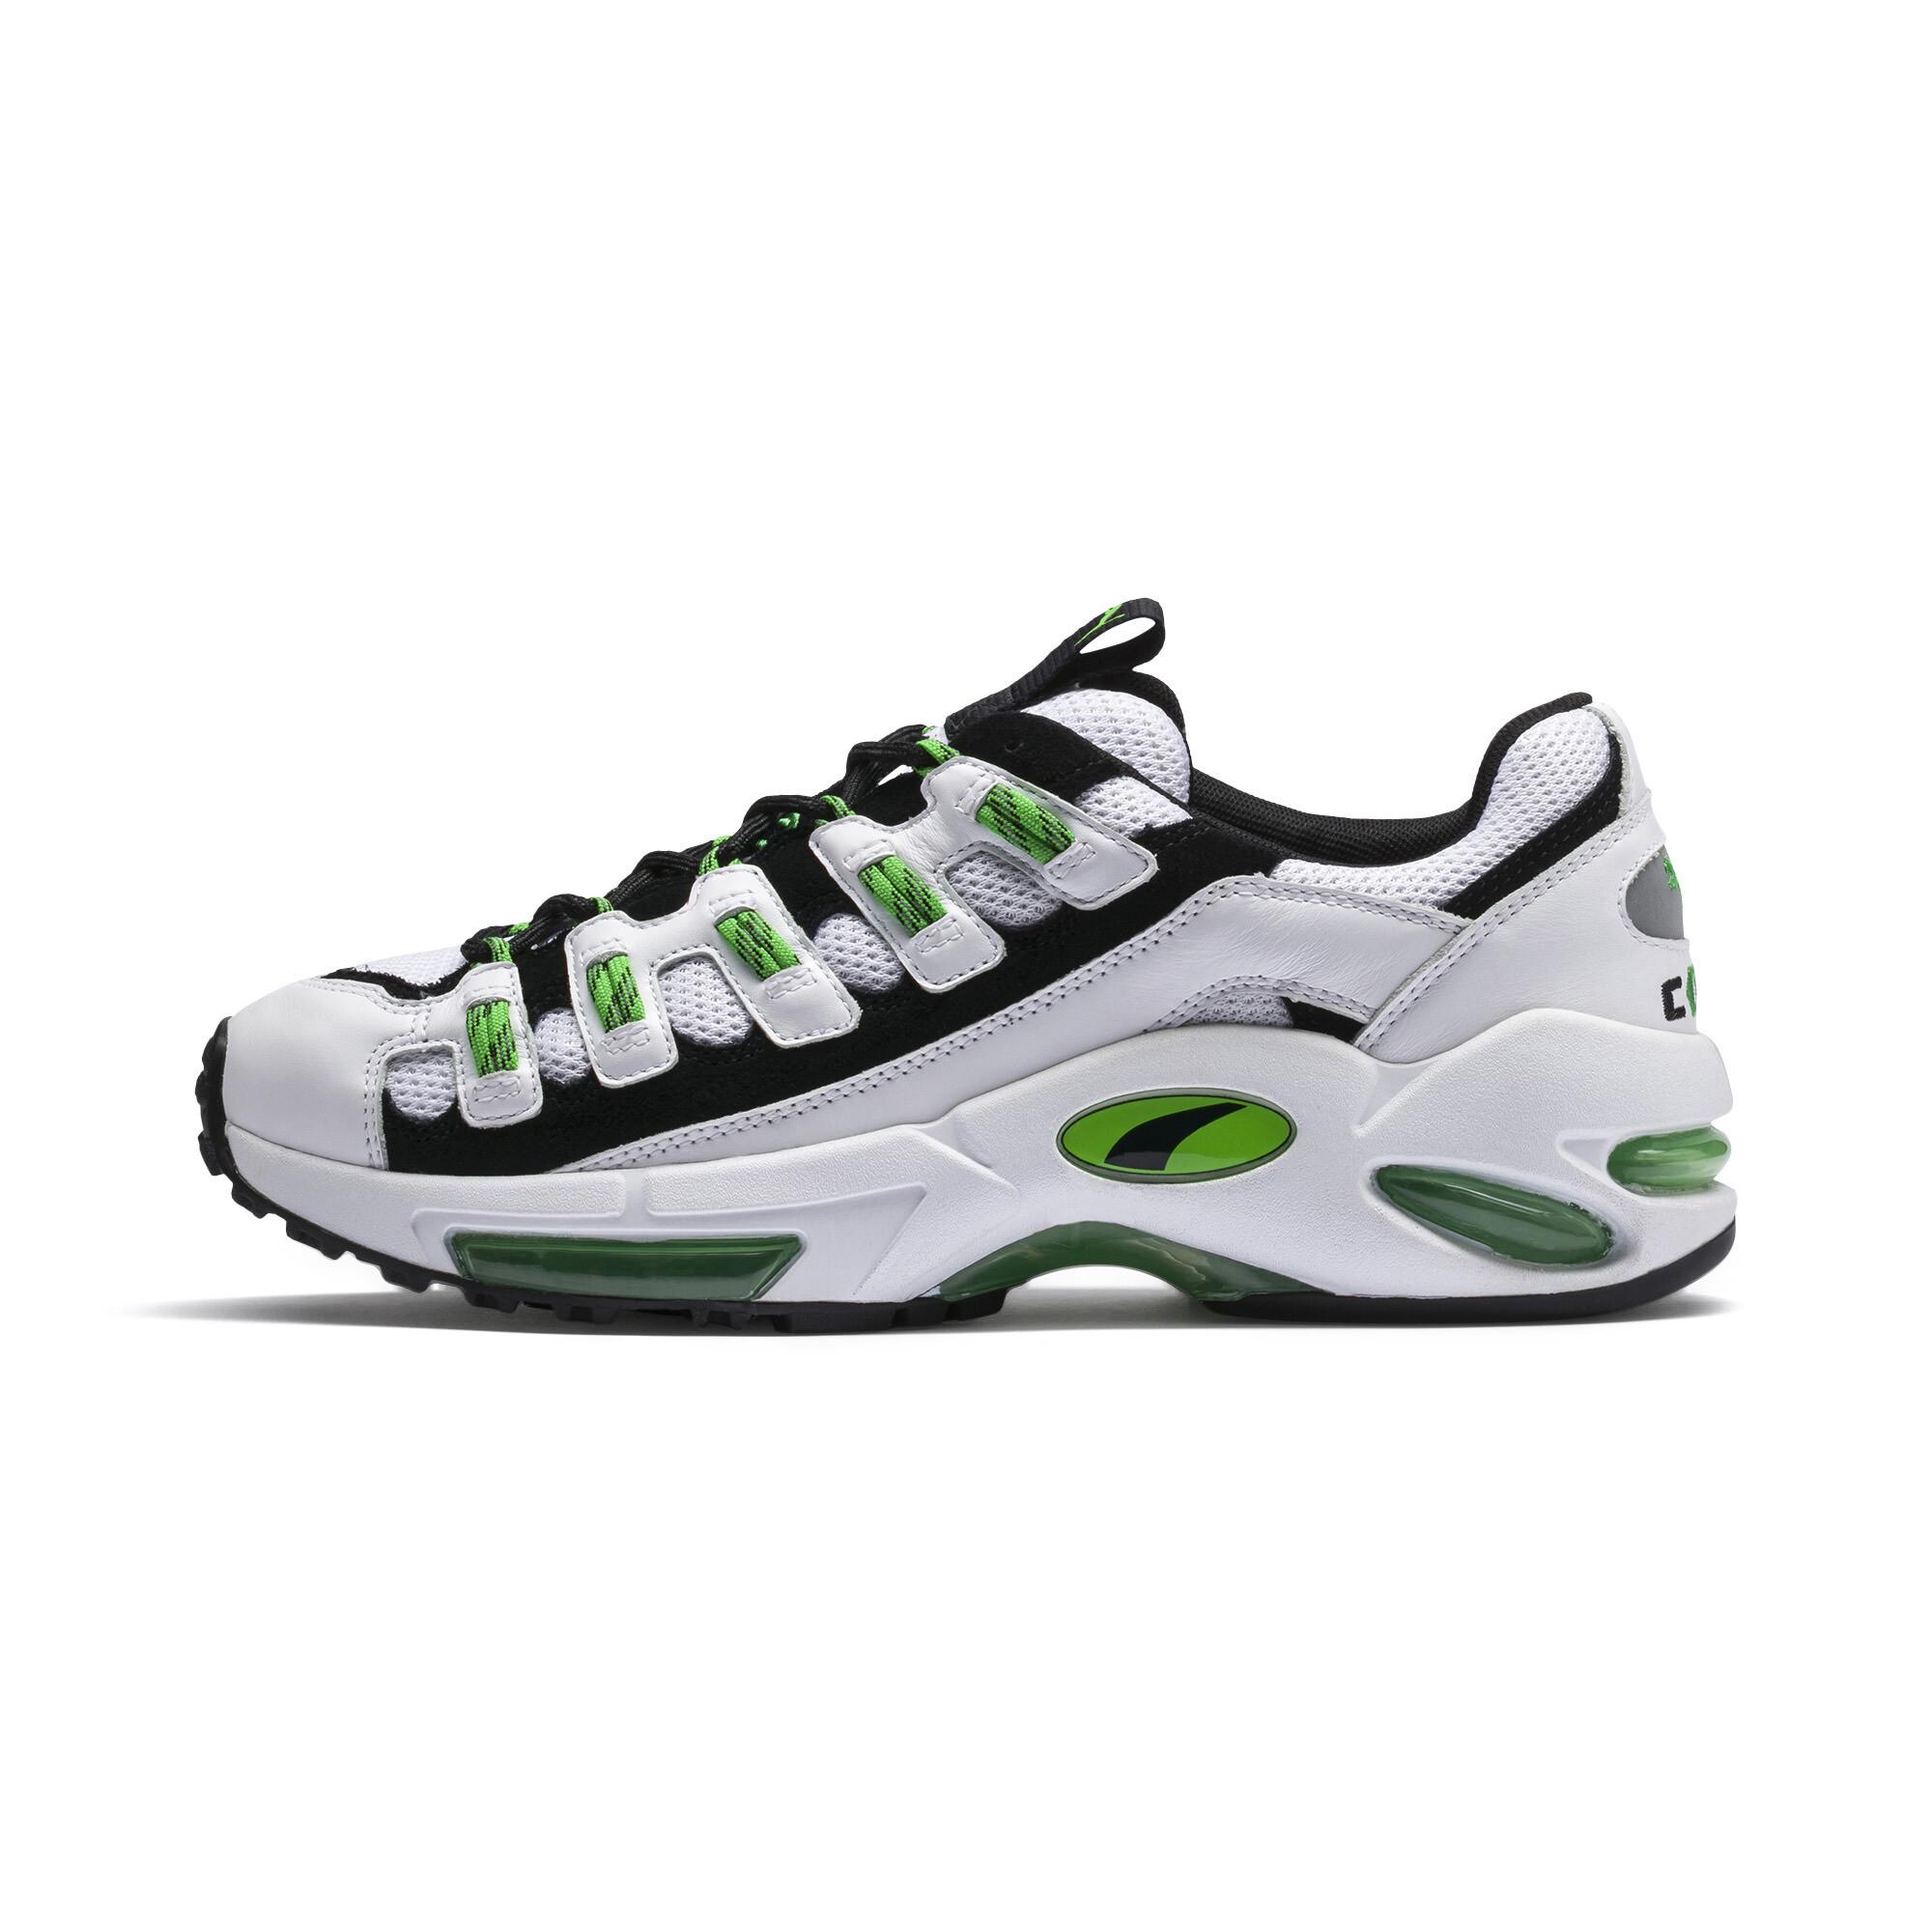 free shipping a58ae 7a0e6 Cell Endura Sneakers   20 - White   Puma